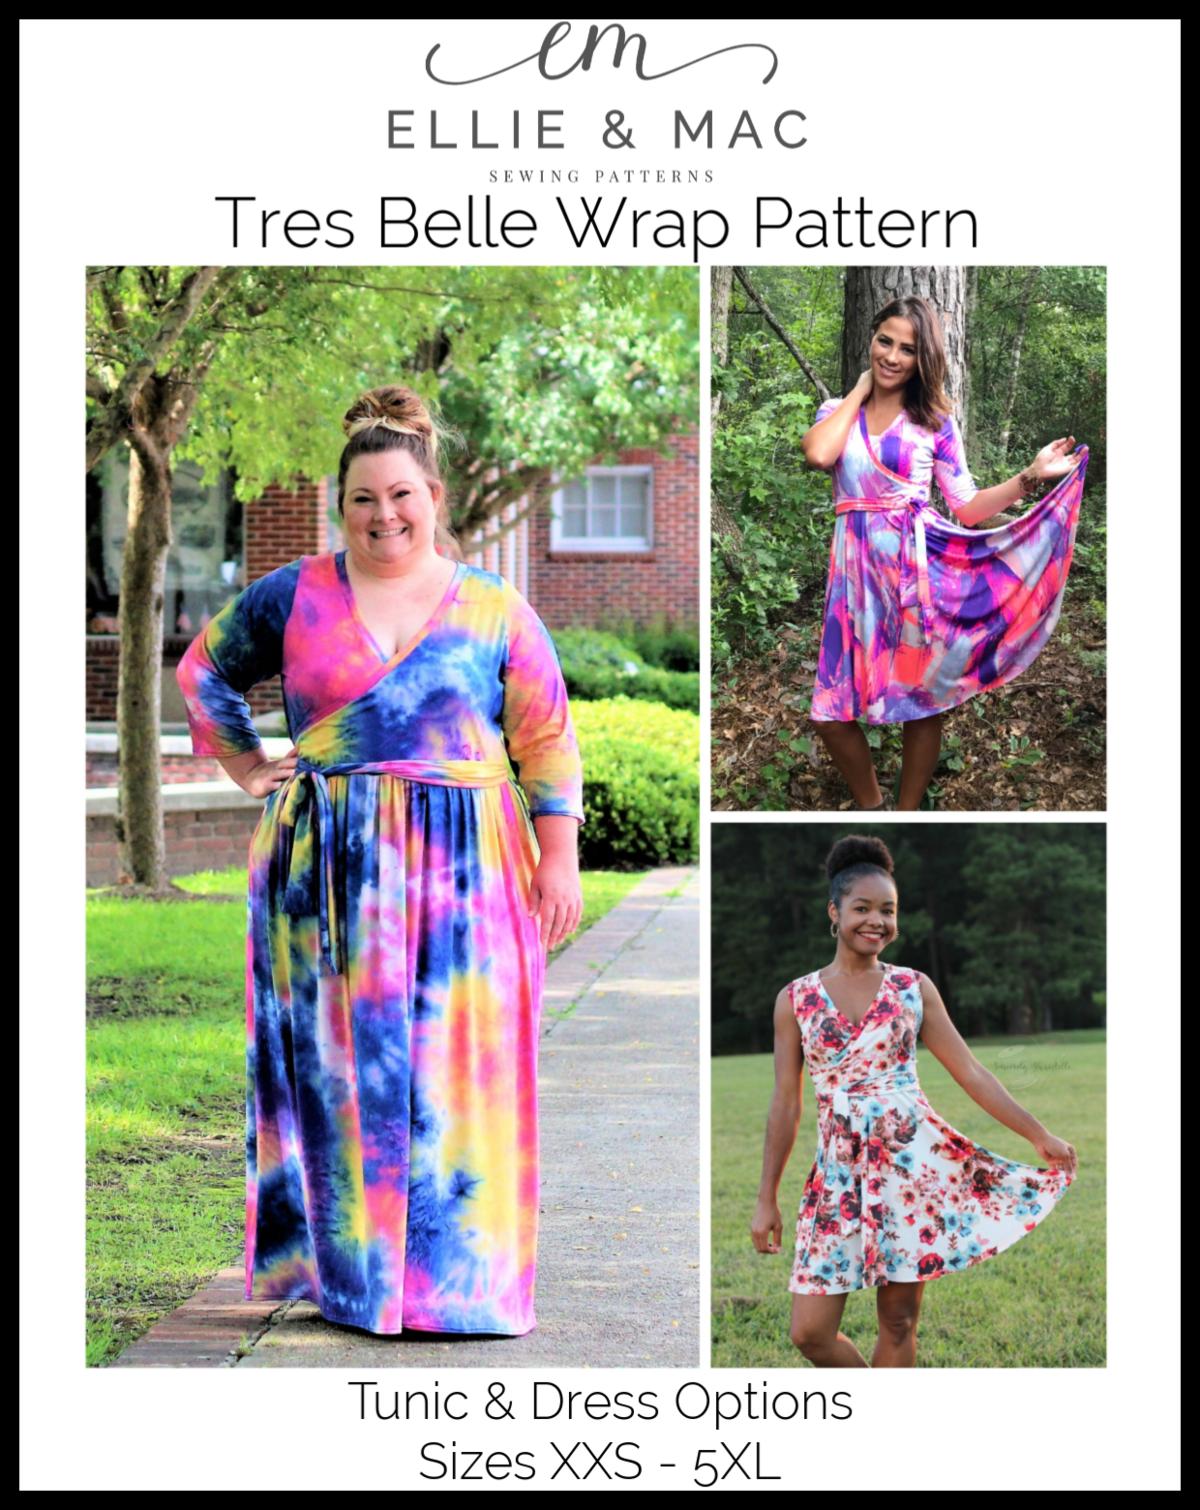 Tres Belle Wrap Tunic Dress Pattern Tunic Dress Patterns Wrap Dress Pattern Dress Pattern [ 1510 x 1200 Pixel ]